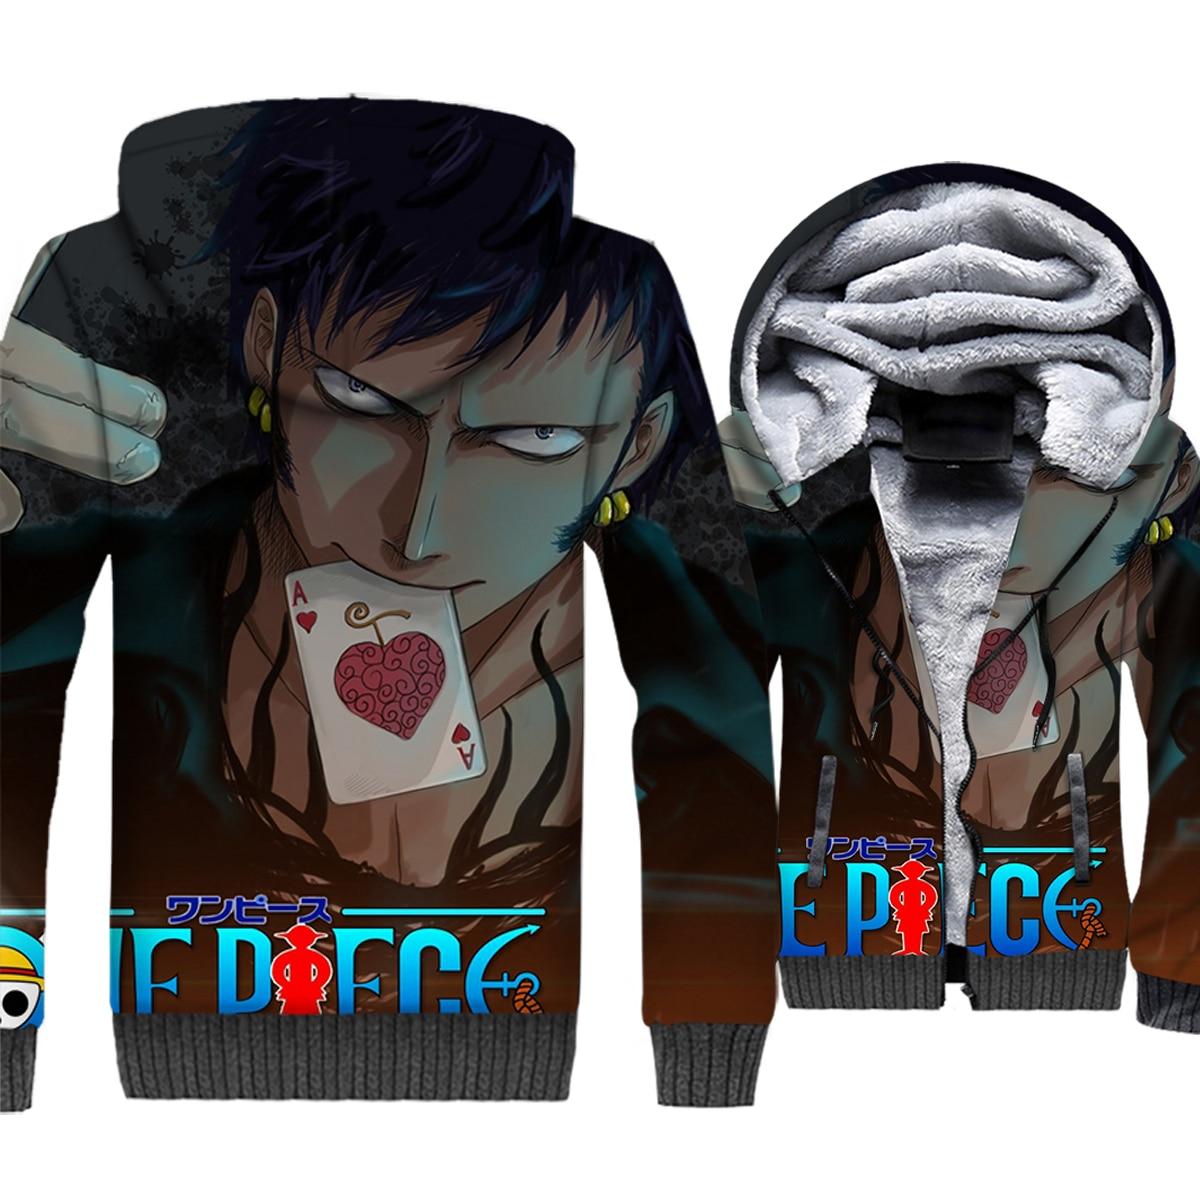 Anime One Piece Luffy Print 3D Hooded 2019 Hot Winter Warm Men Jackets Thick Warm Fleece Hoodies Plus Size Men's Tracksuit M-5XL